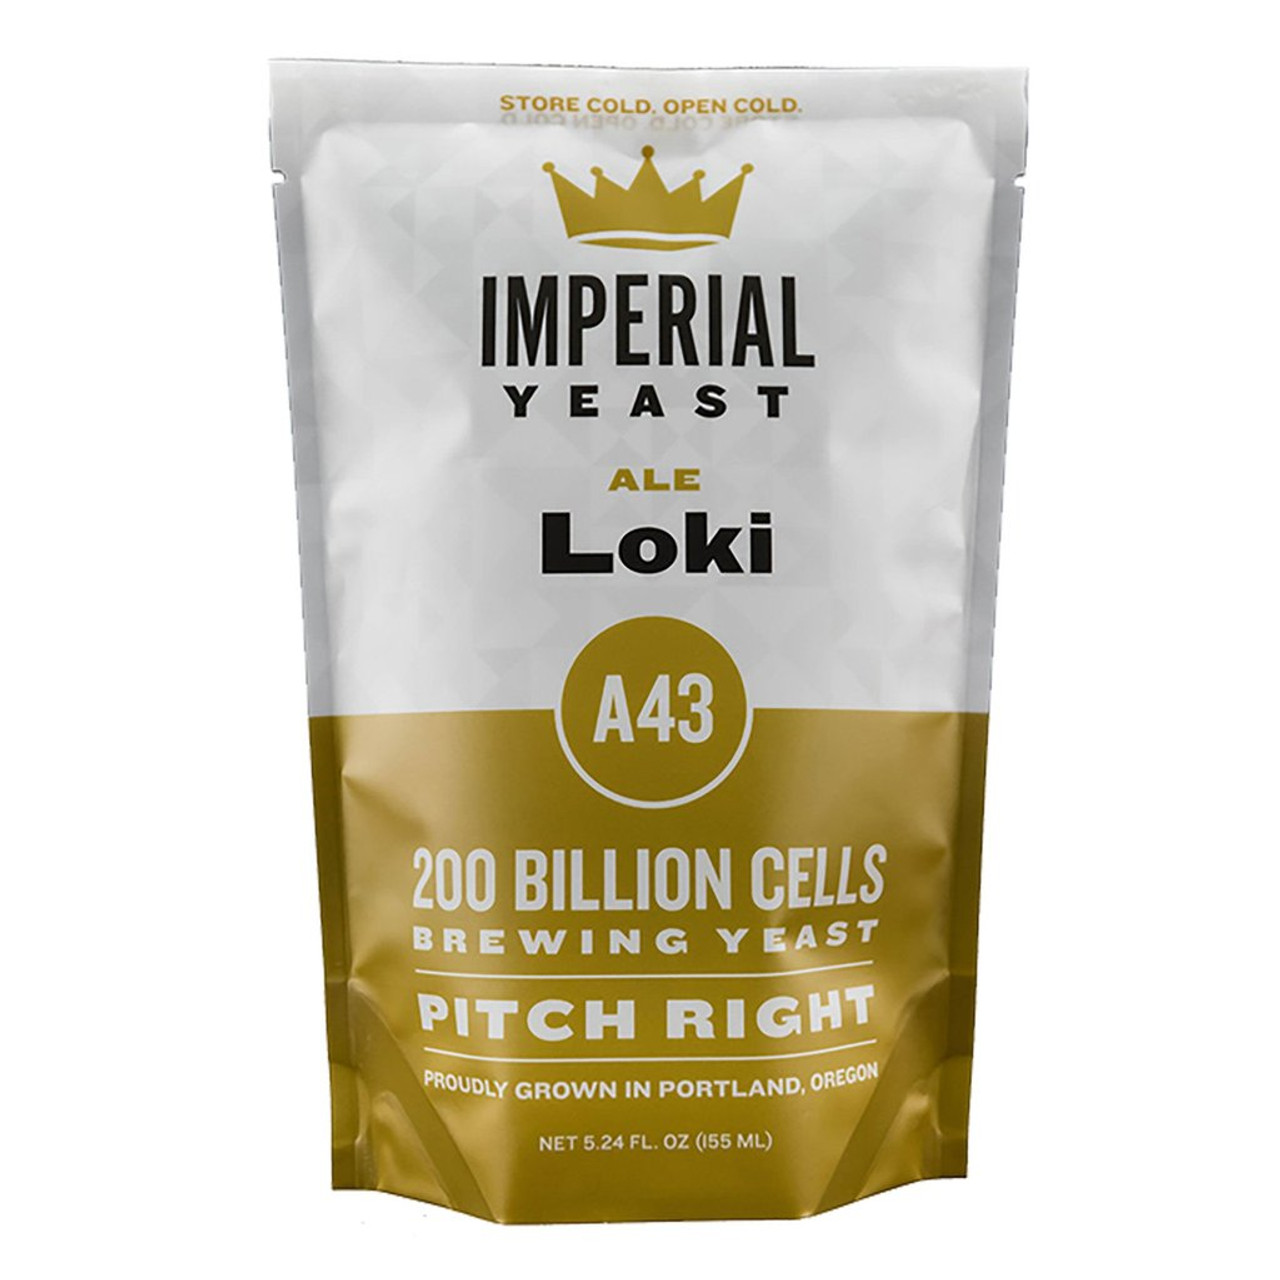 Imperial Yeast - A43 Loki